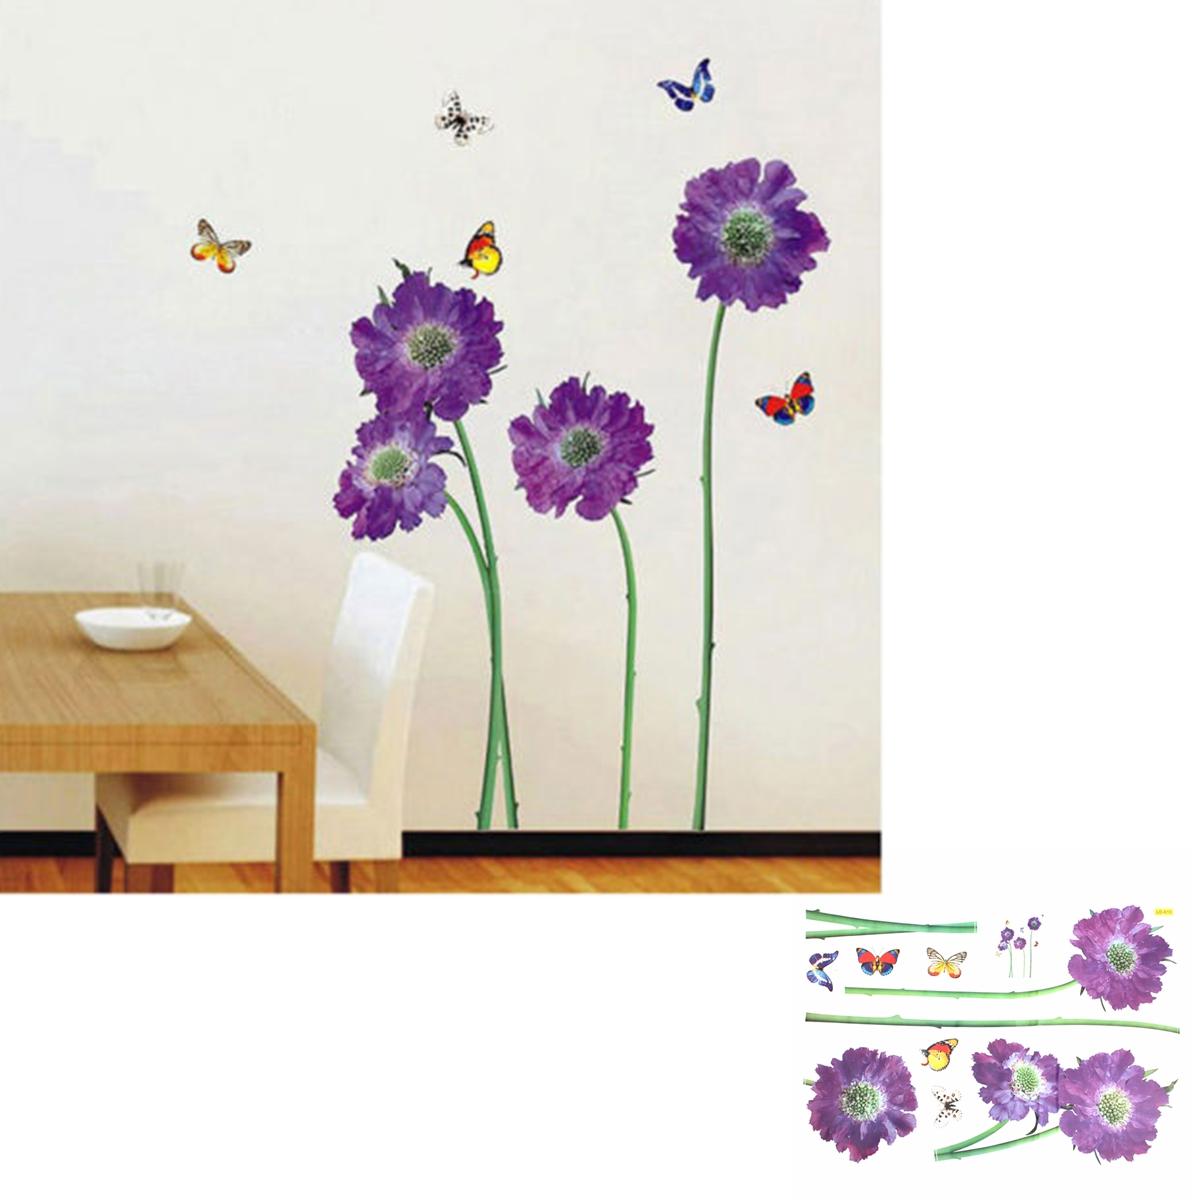 flowers wall stickers living room diy home decor. Black Bedroom Furniture Sets. Home Design Ideas